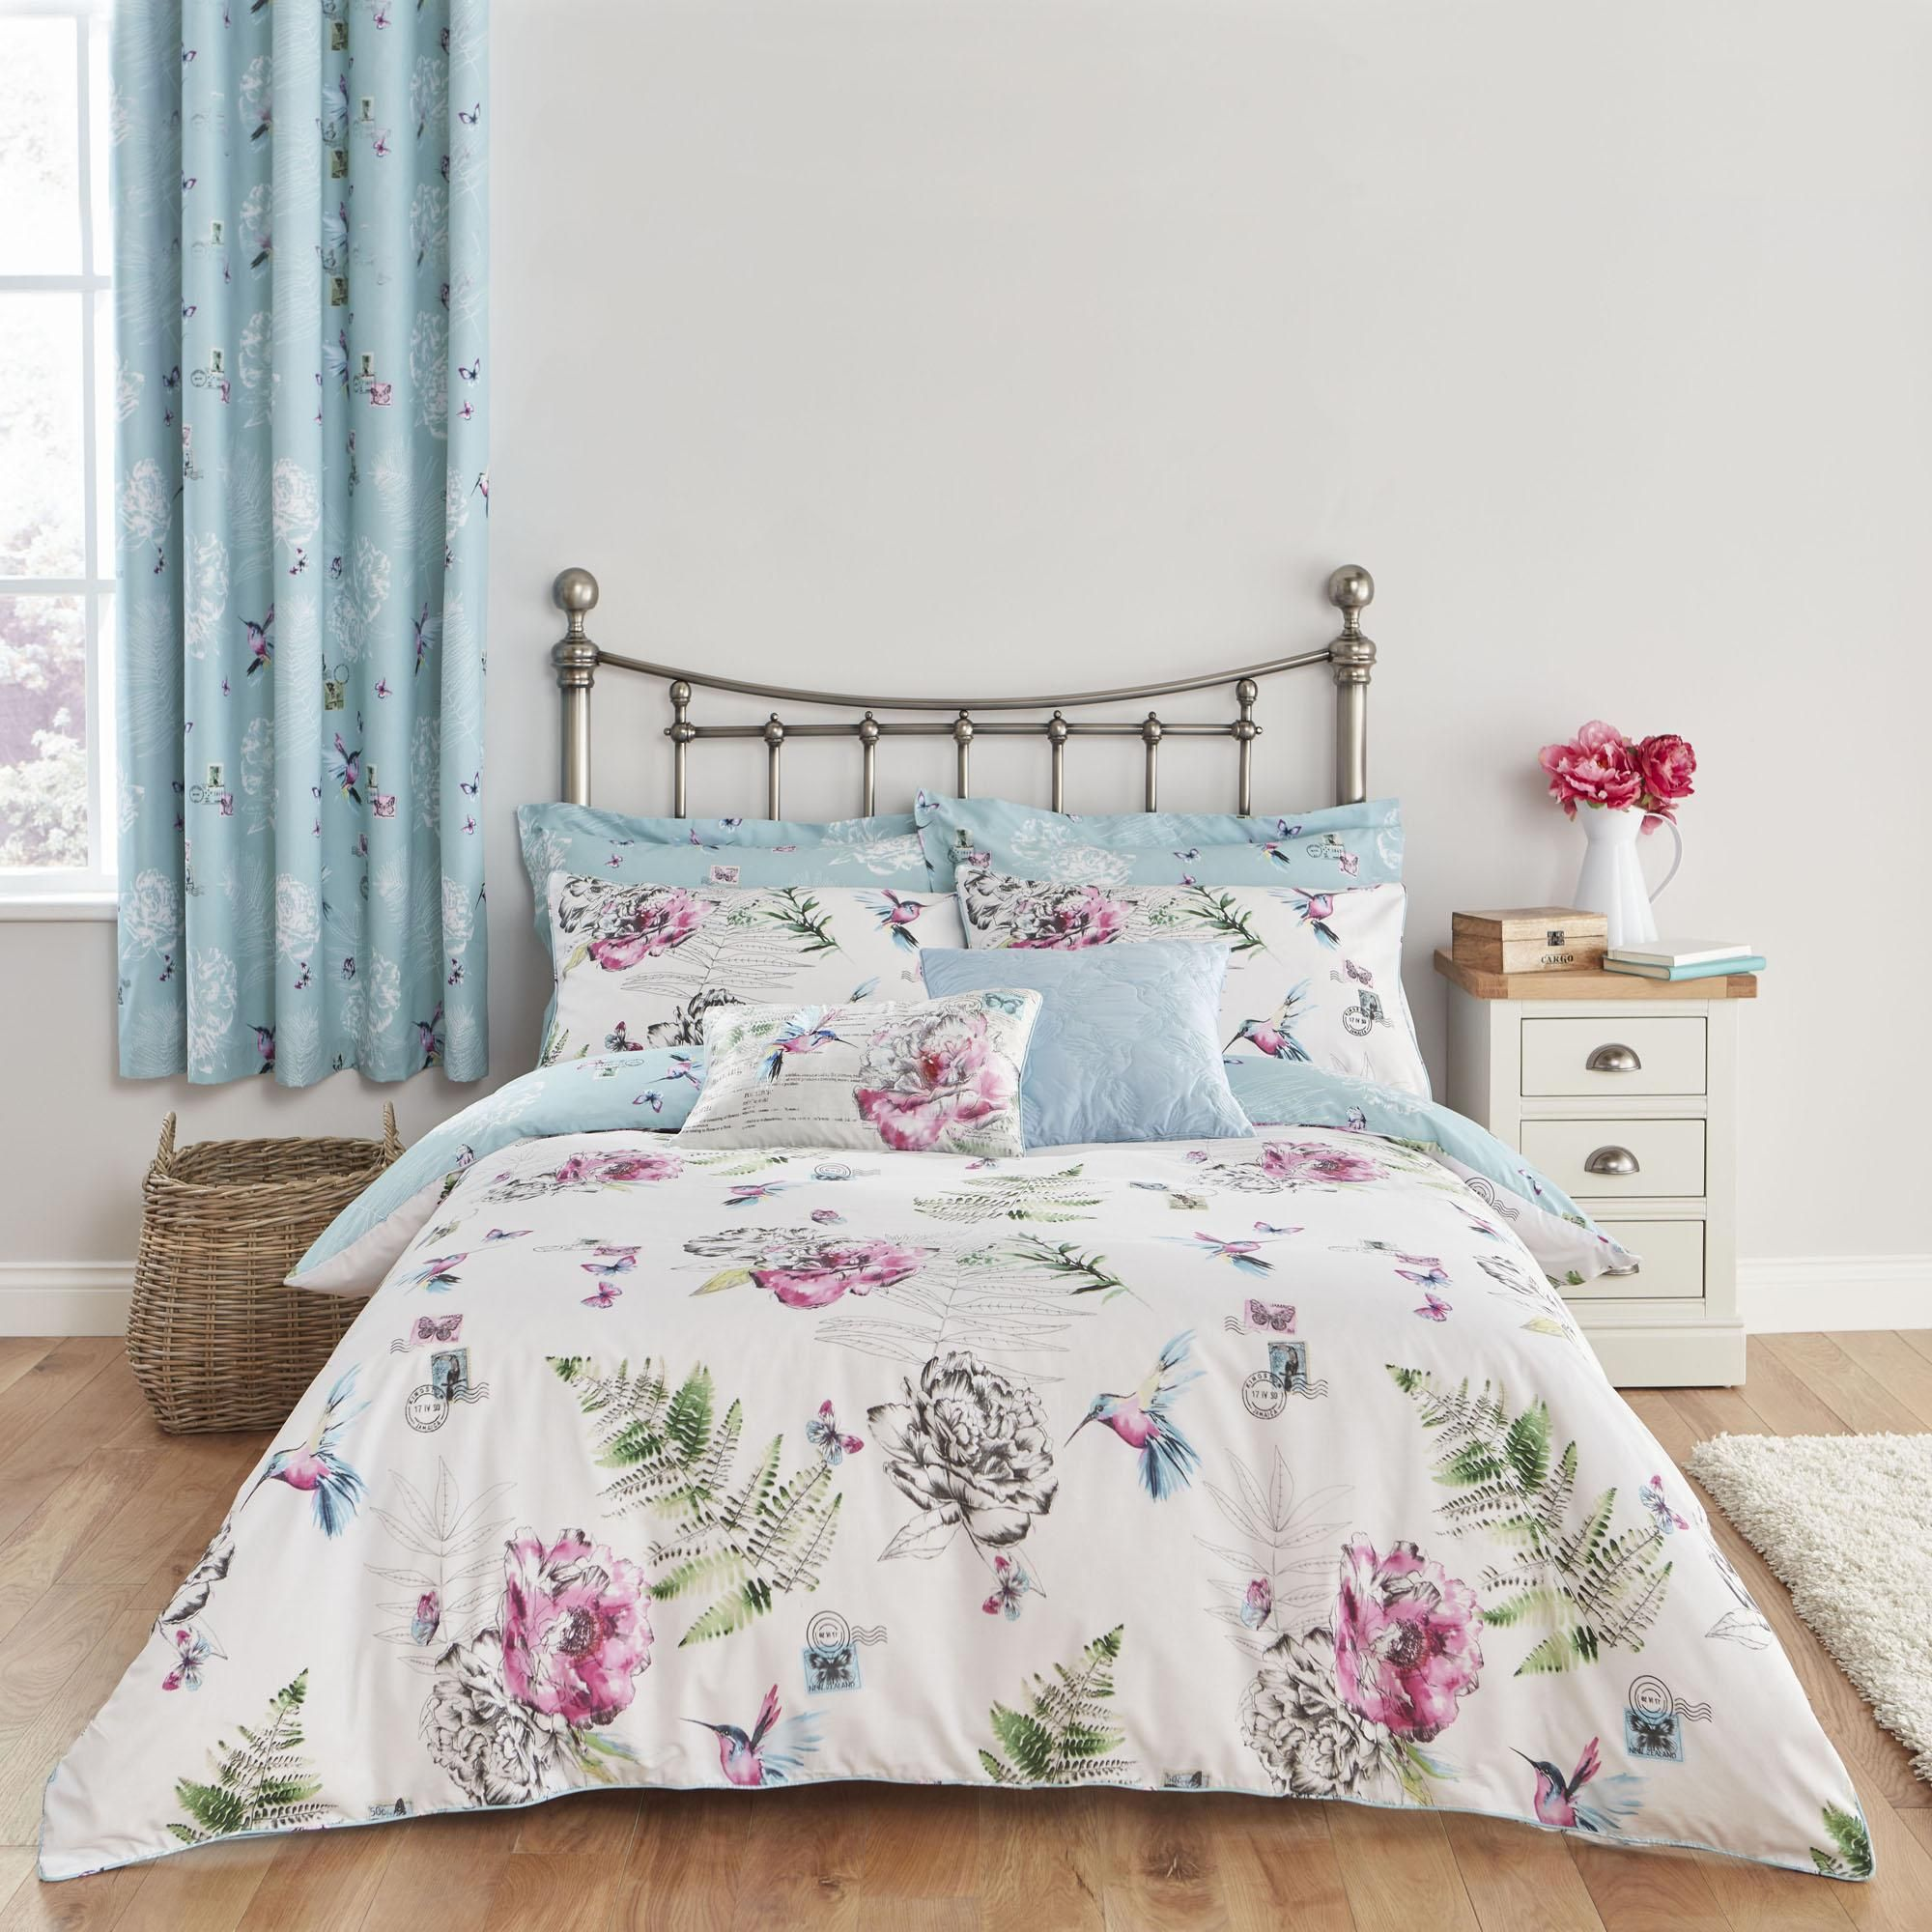 Watercolour Effect Duvet Cover With Pillowcase Polycotton Reversible Bedding Set